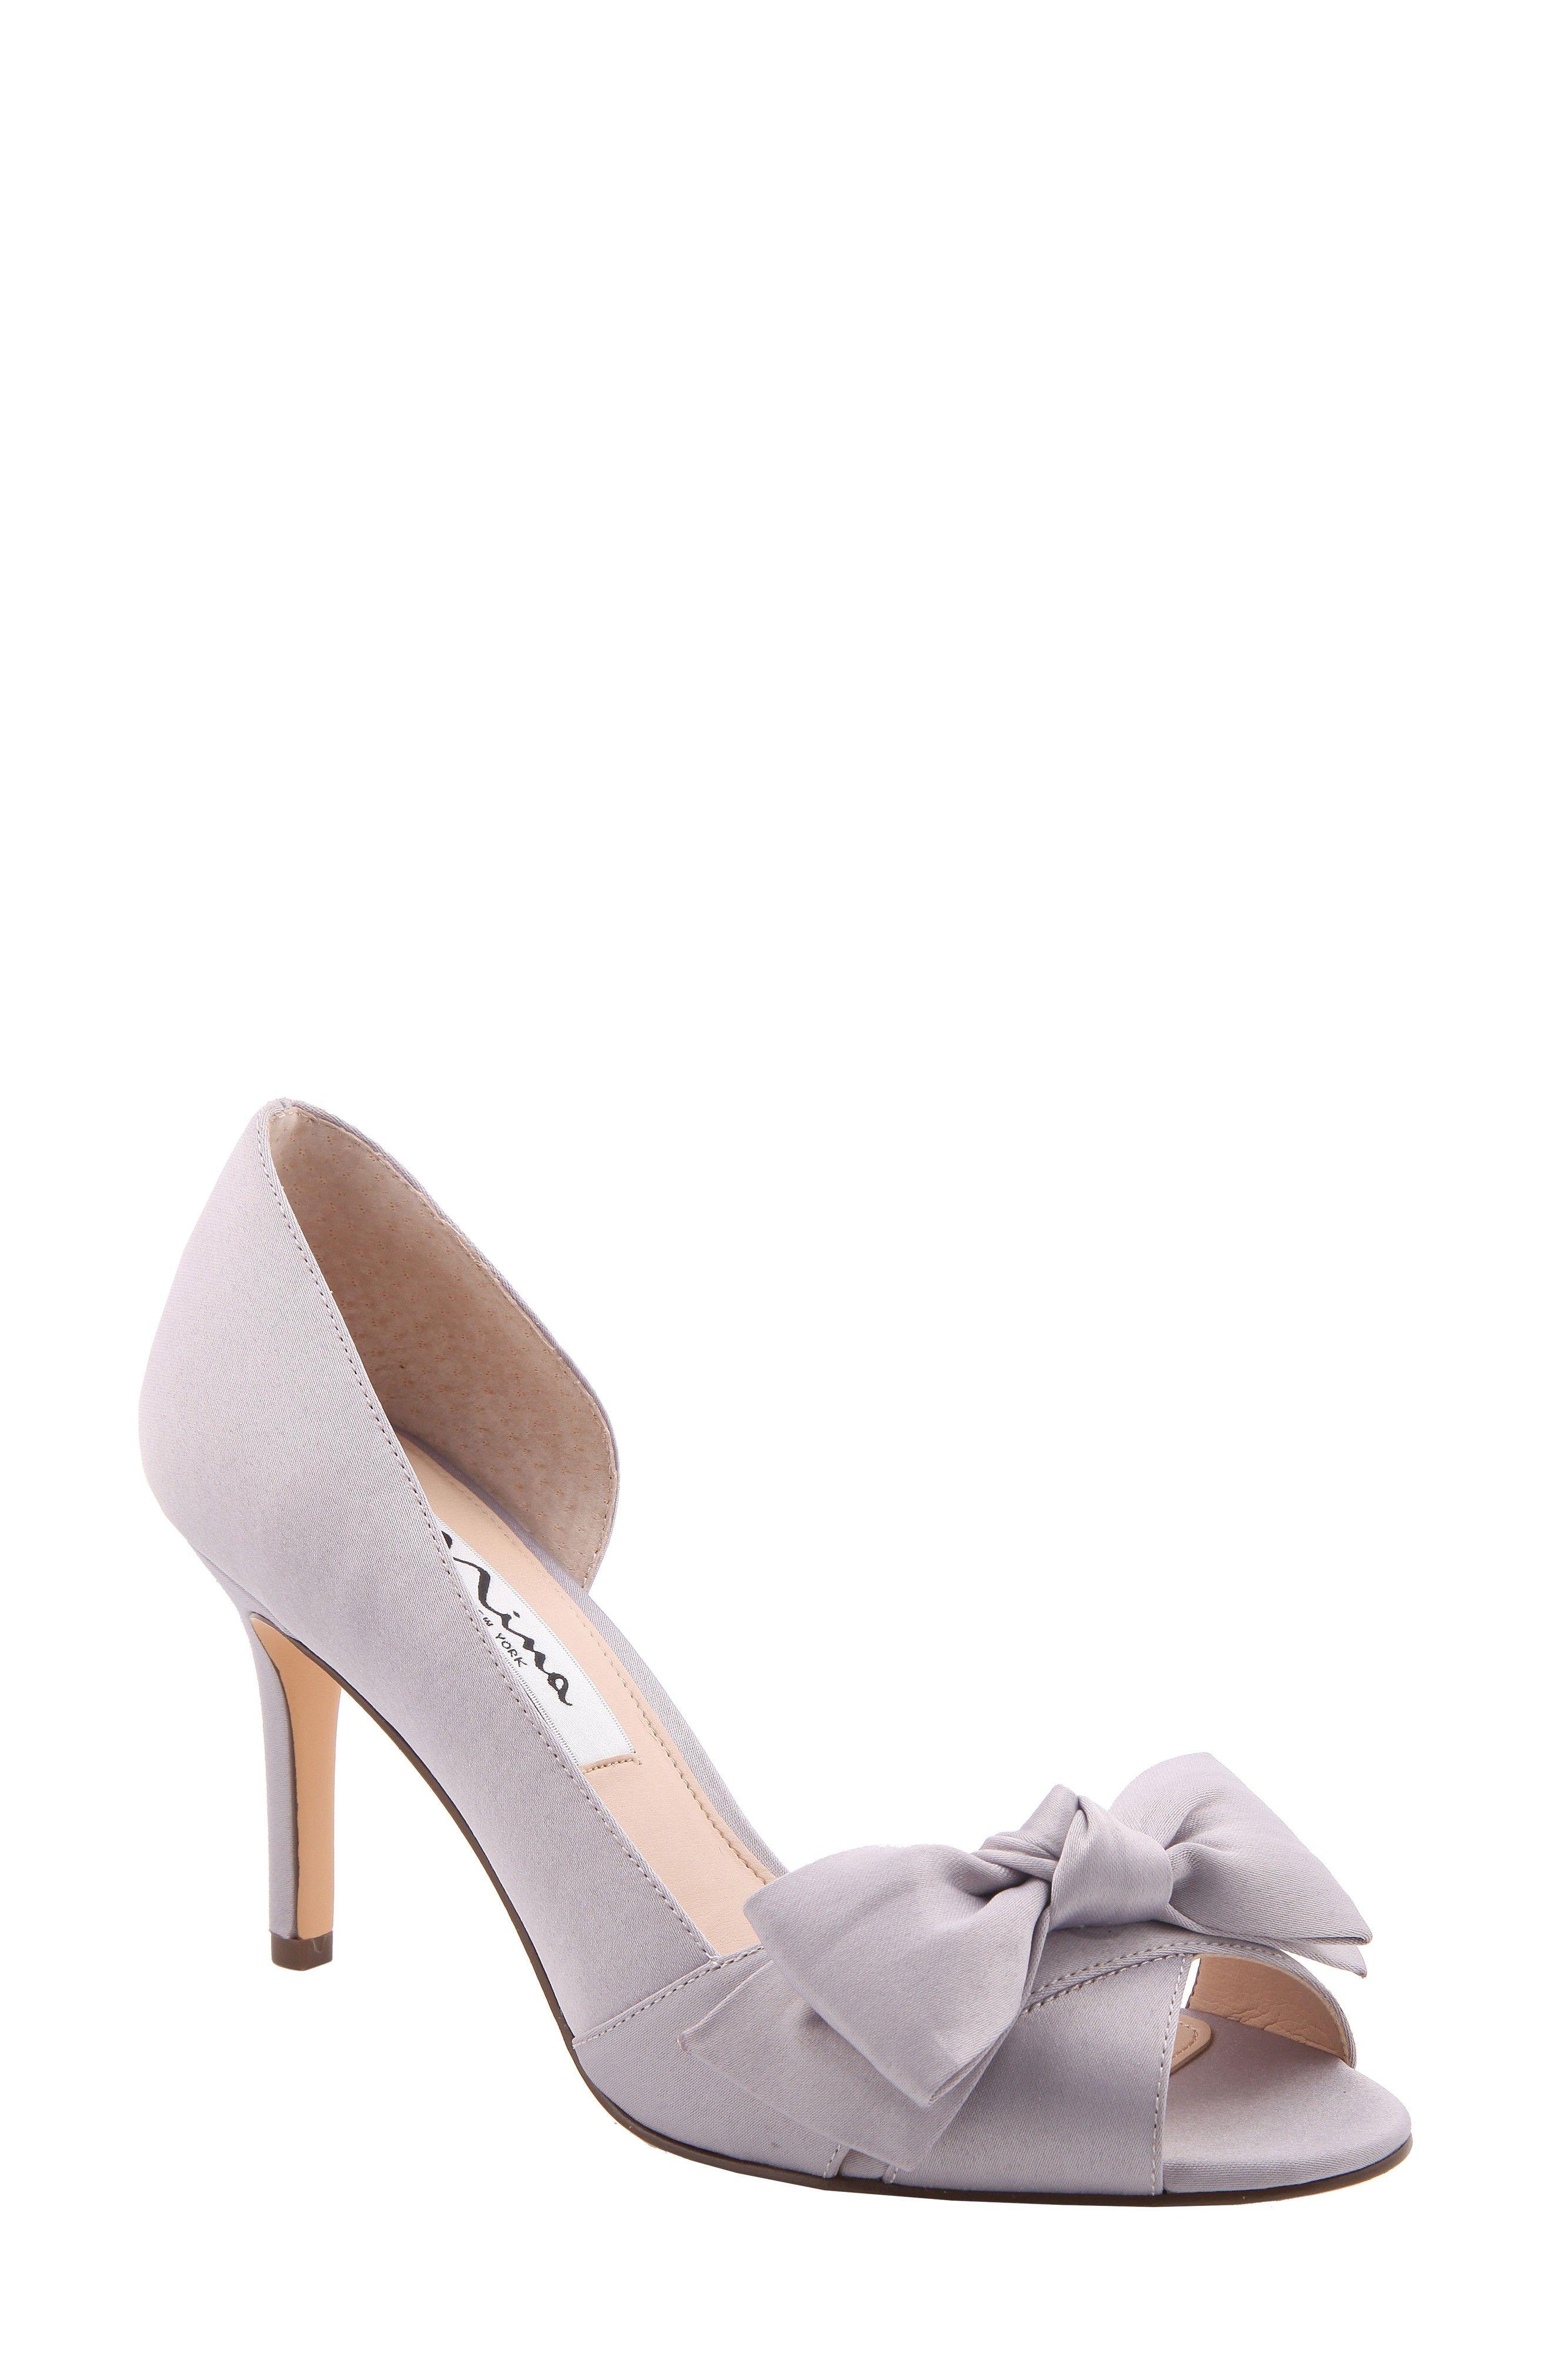 6a2a6560e331 New NINA Forbes II Peep Toe Pump online. New NINA Heels.   84.95 ...